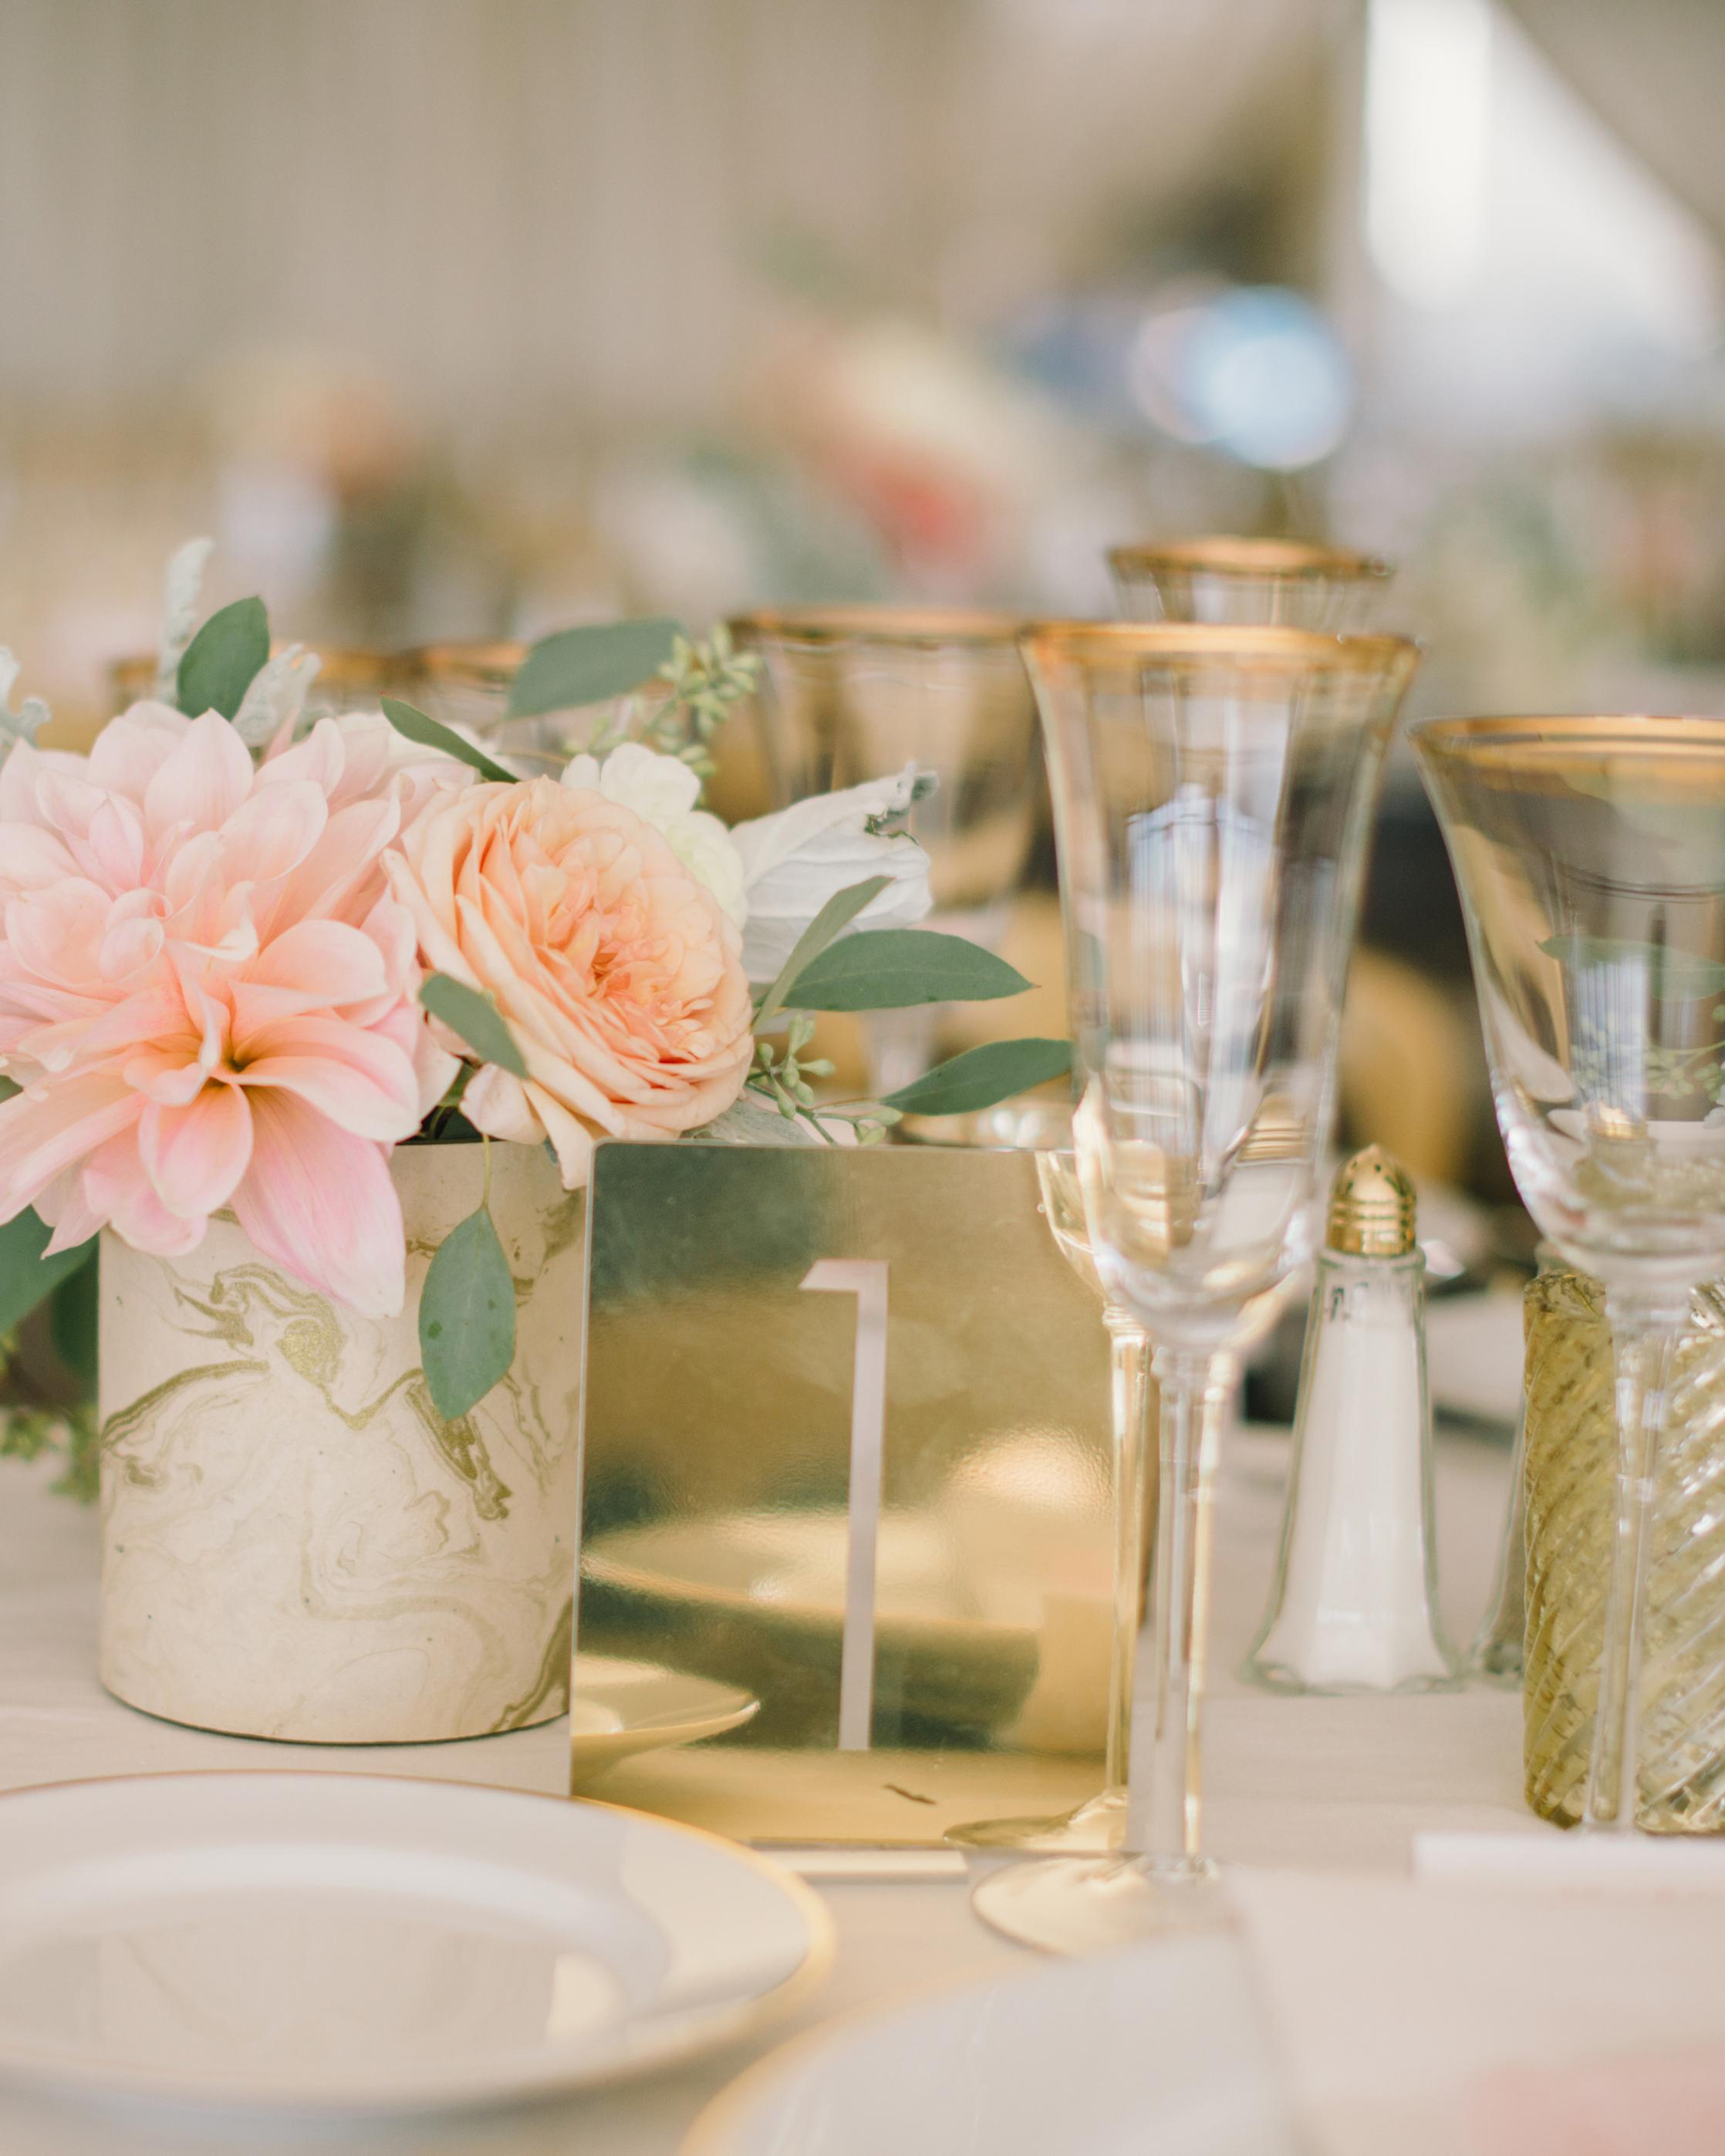 alex-brandon-wedding-tablenumber-035-s111338-0714.jpg